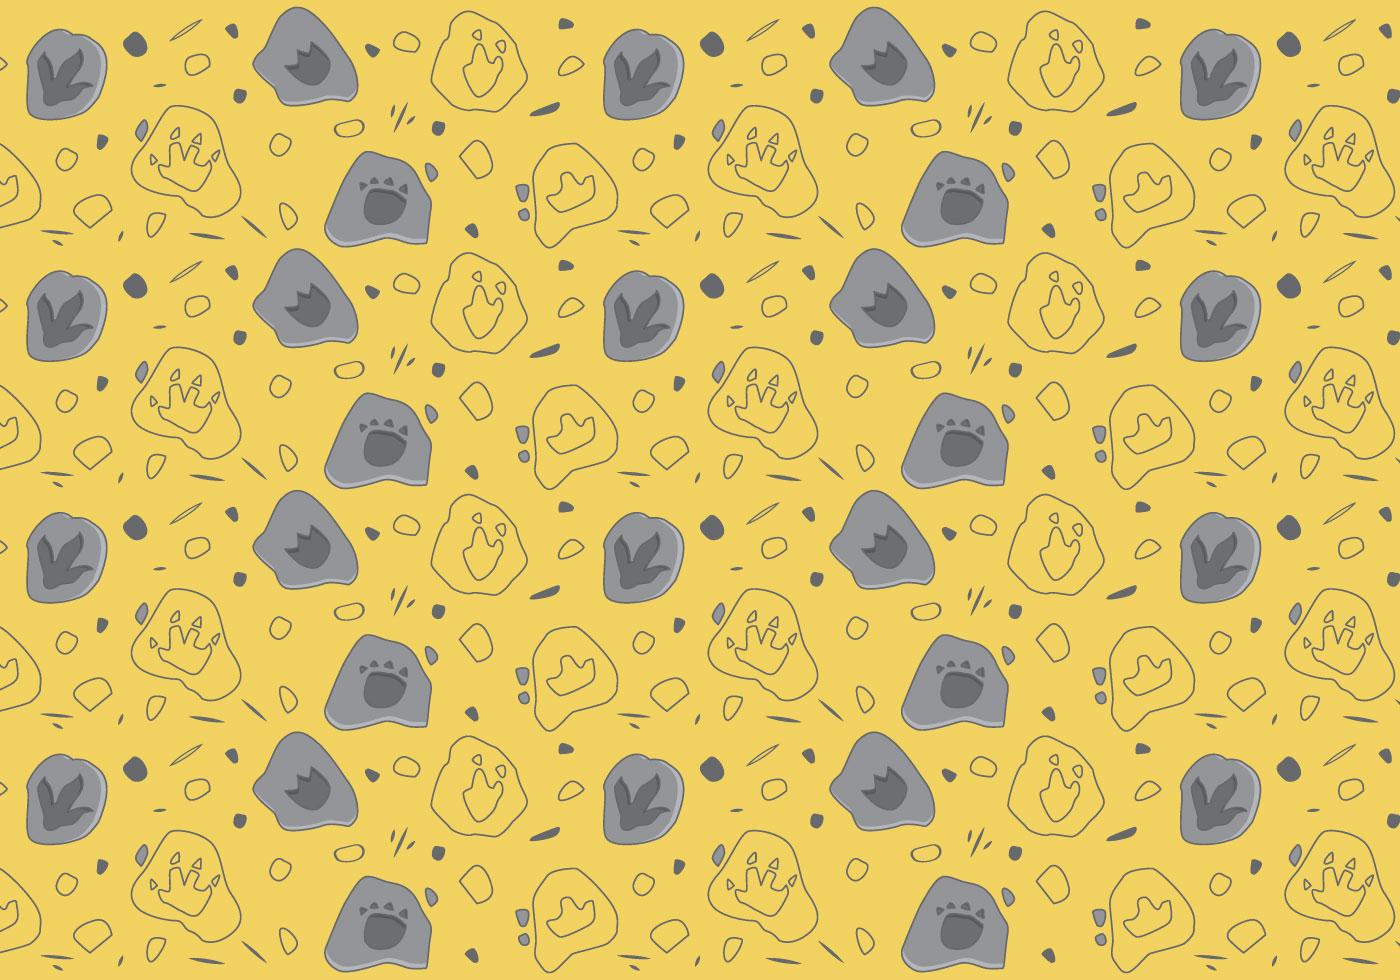 Cute Paw Print Wallpaper Free Dinosaur Pattern 5 Download Free Vector Art Stock